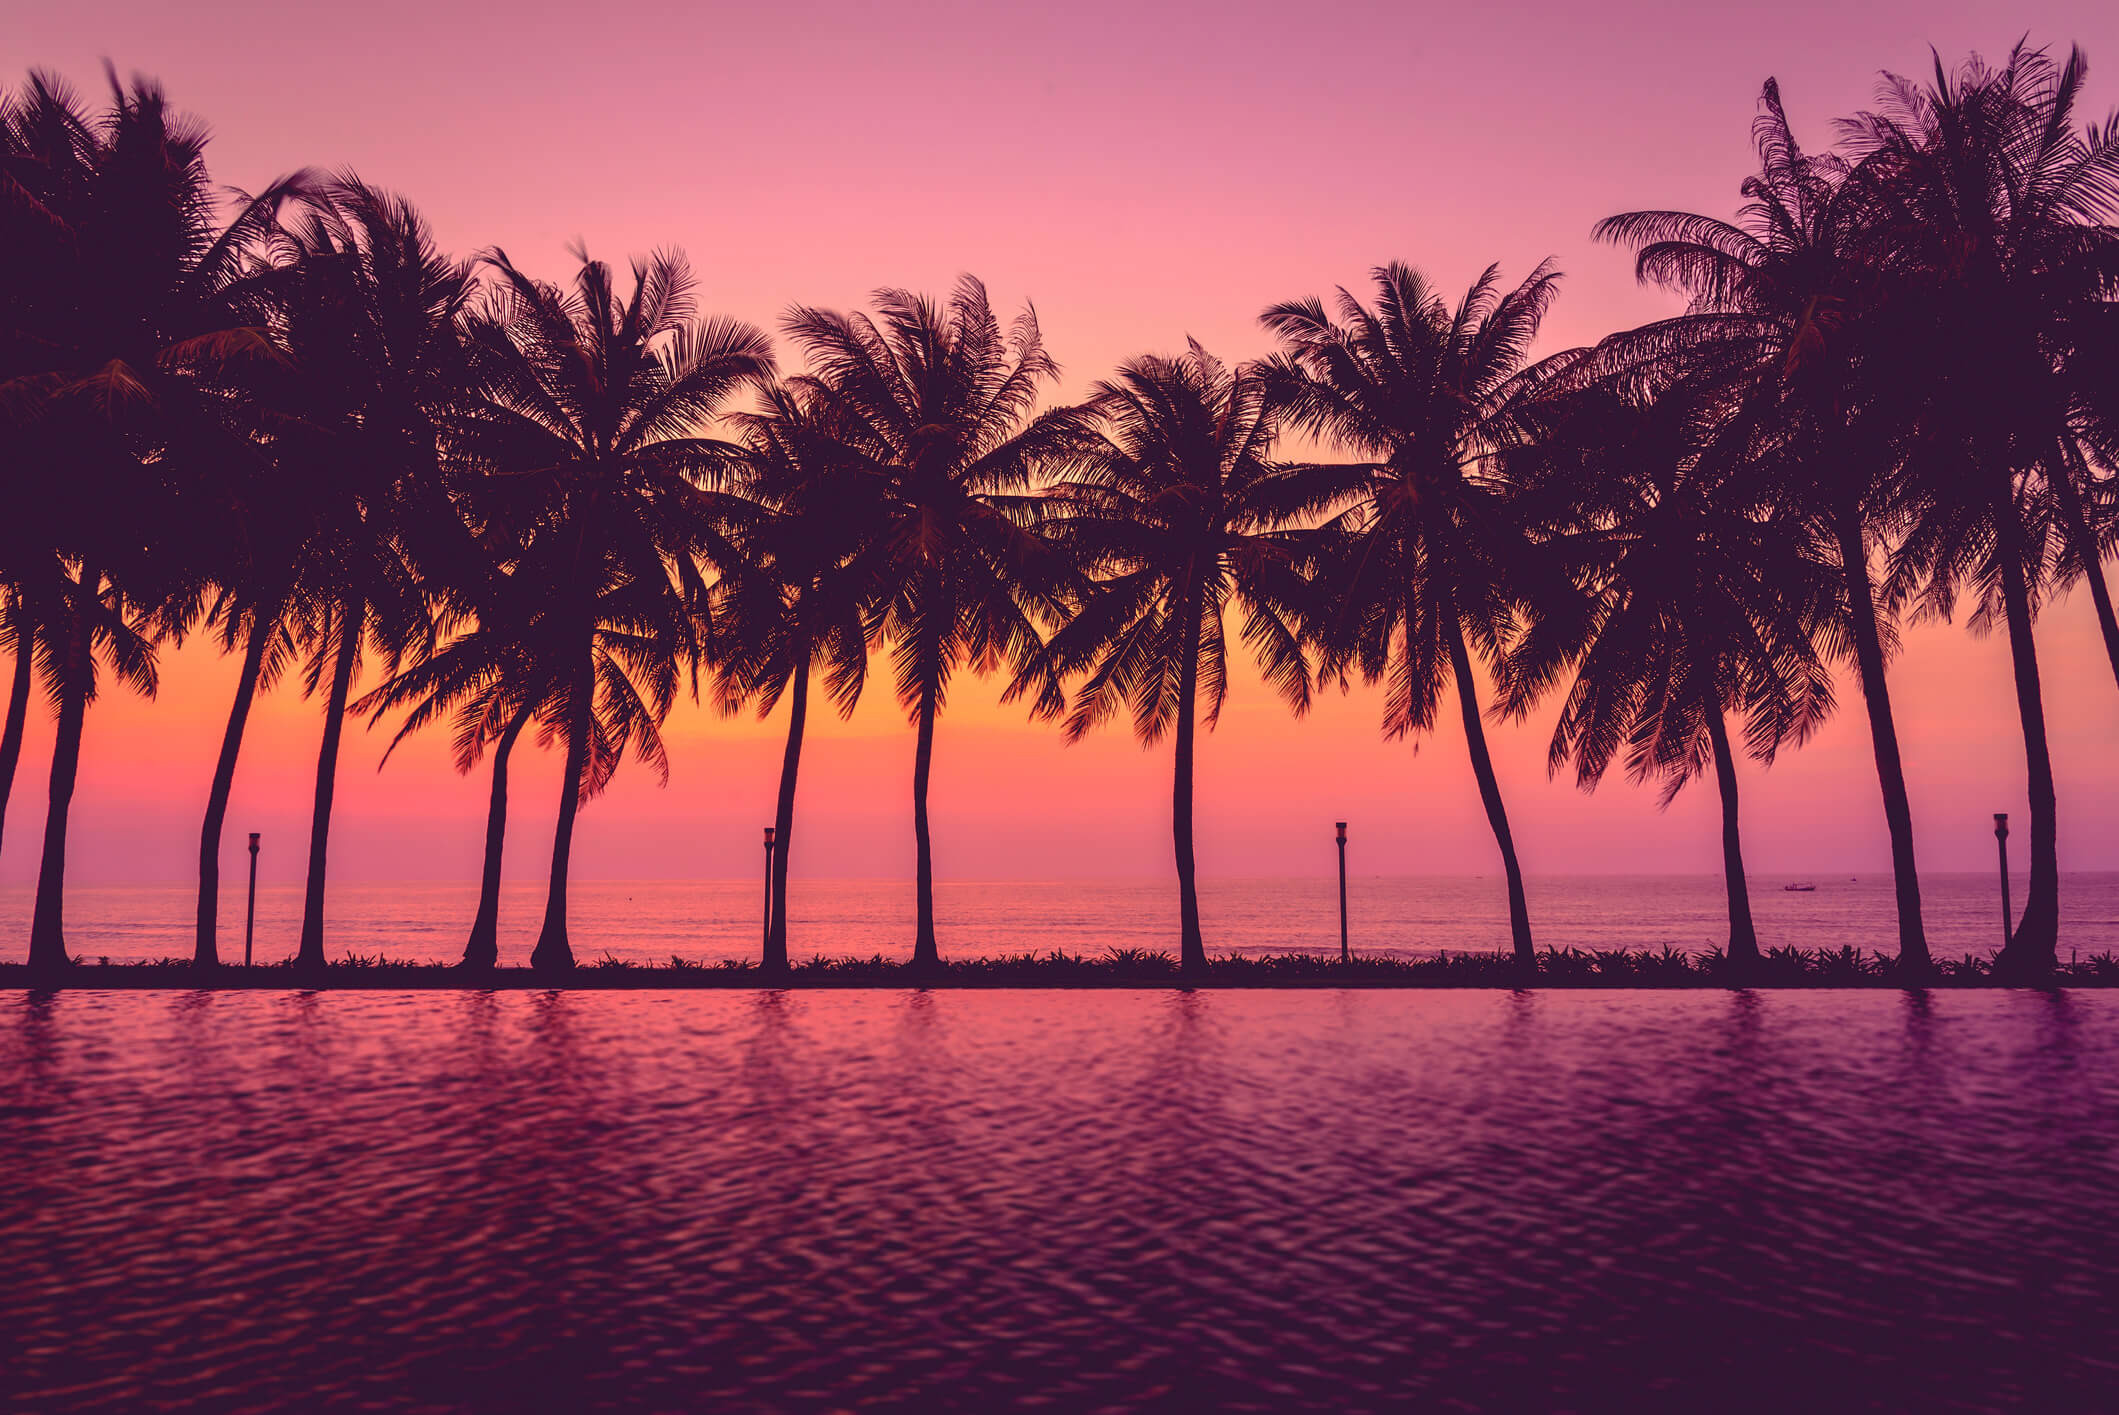 Palm Tree Wallpaper Desktop (69+ images)